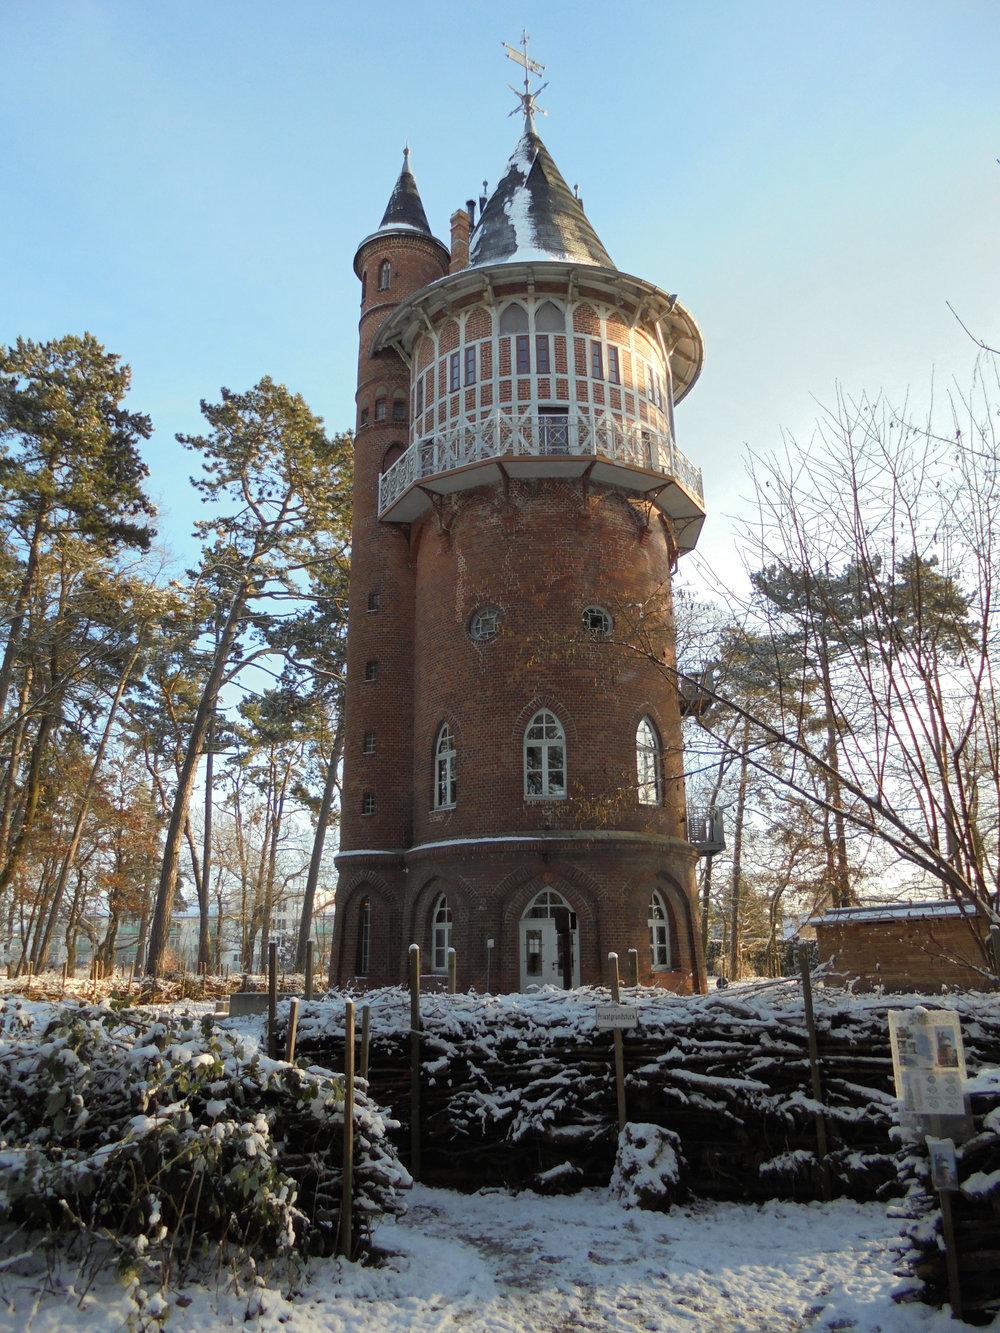 Winterturm Hochformat_1_©BEWAHREN Ferienhaus eG.jpg